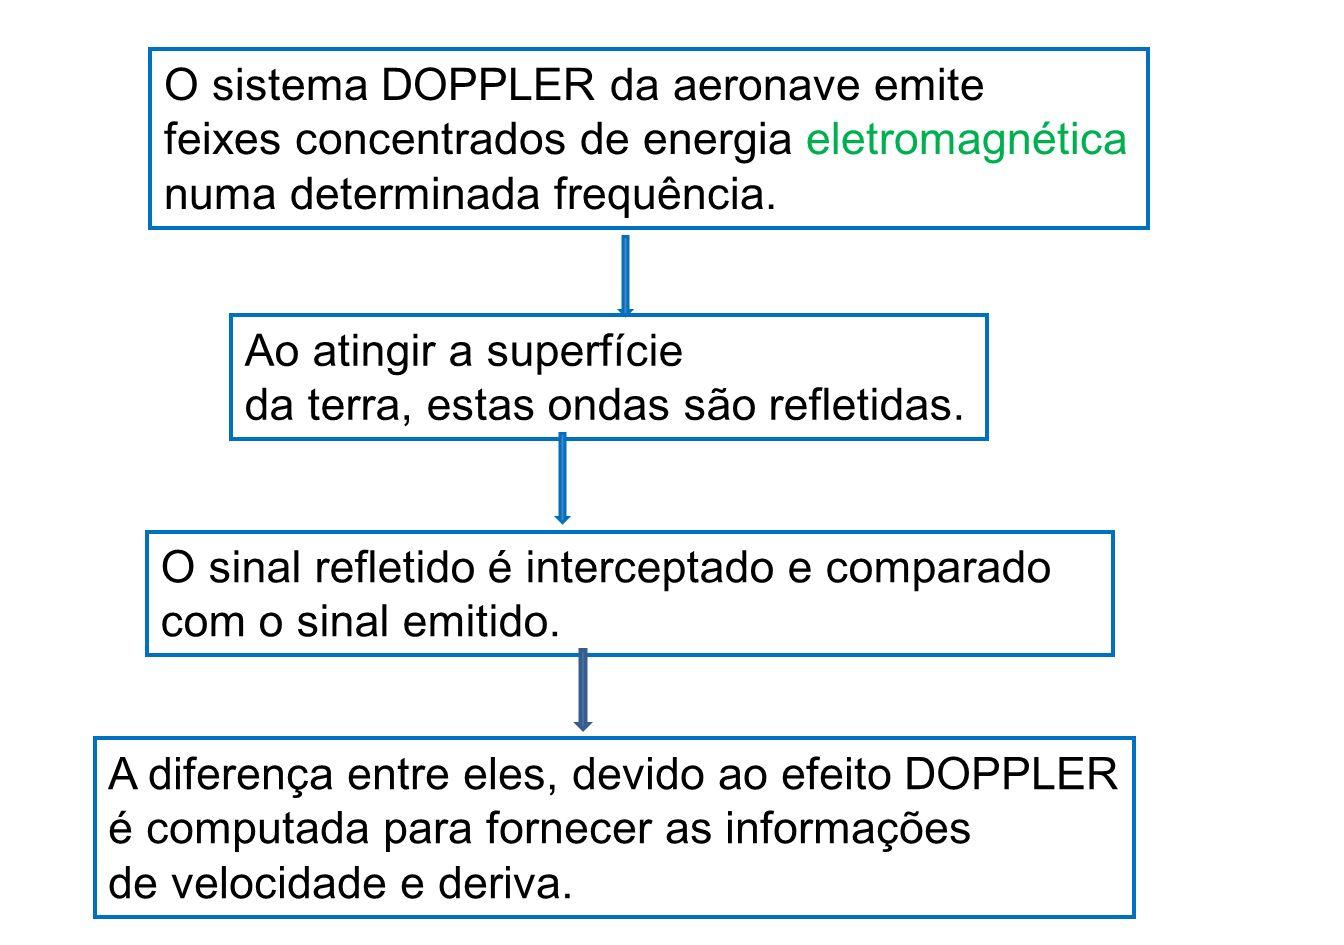 O sistema DOPPLER da aeronave emite